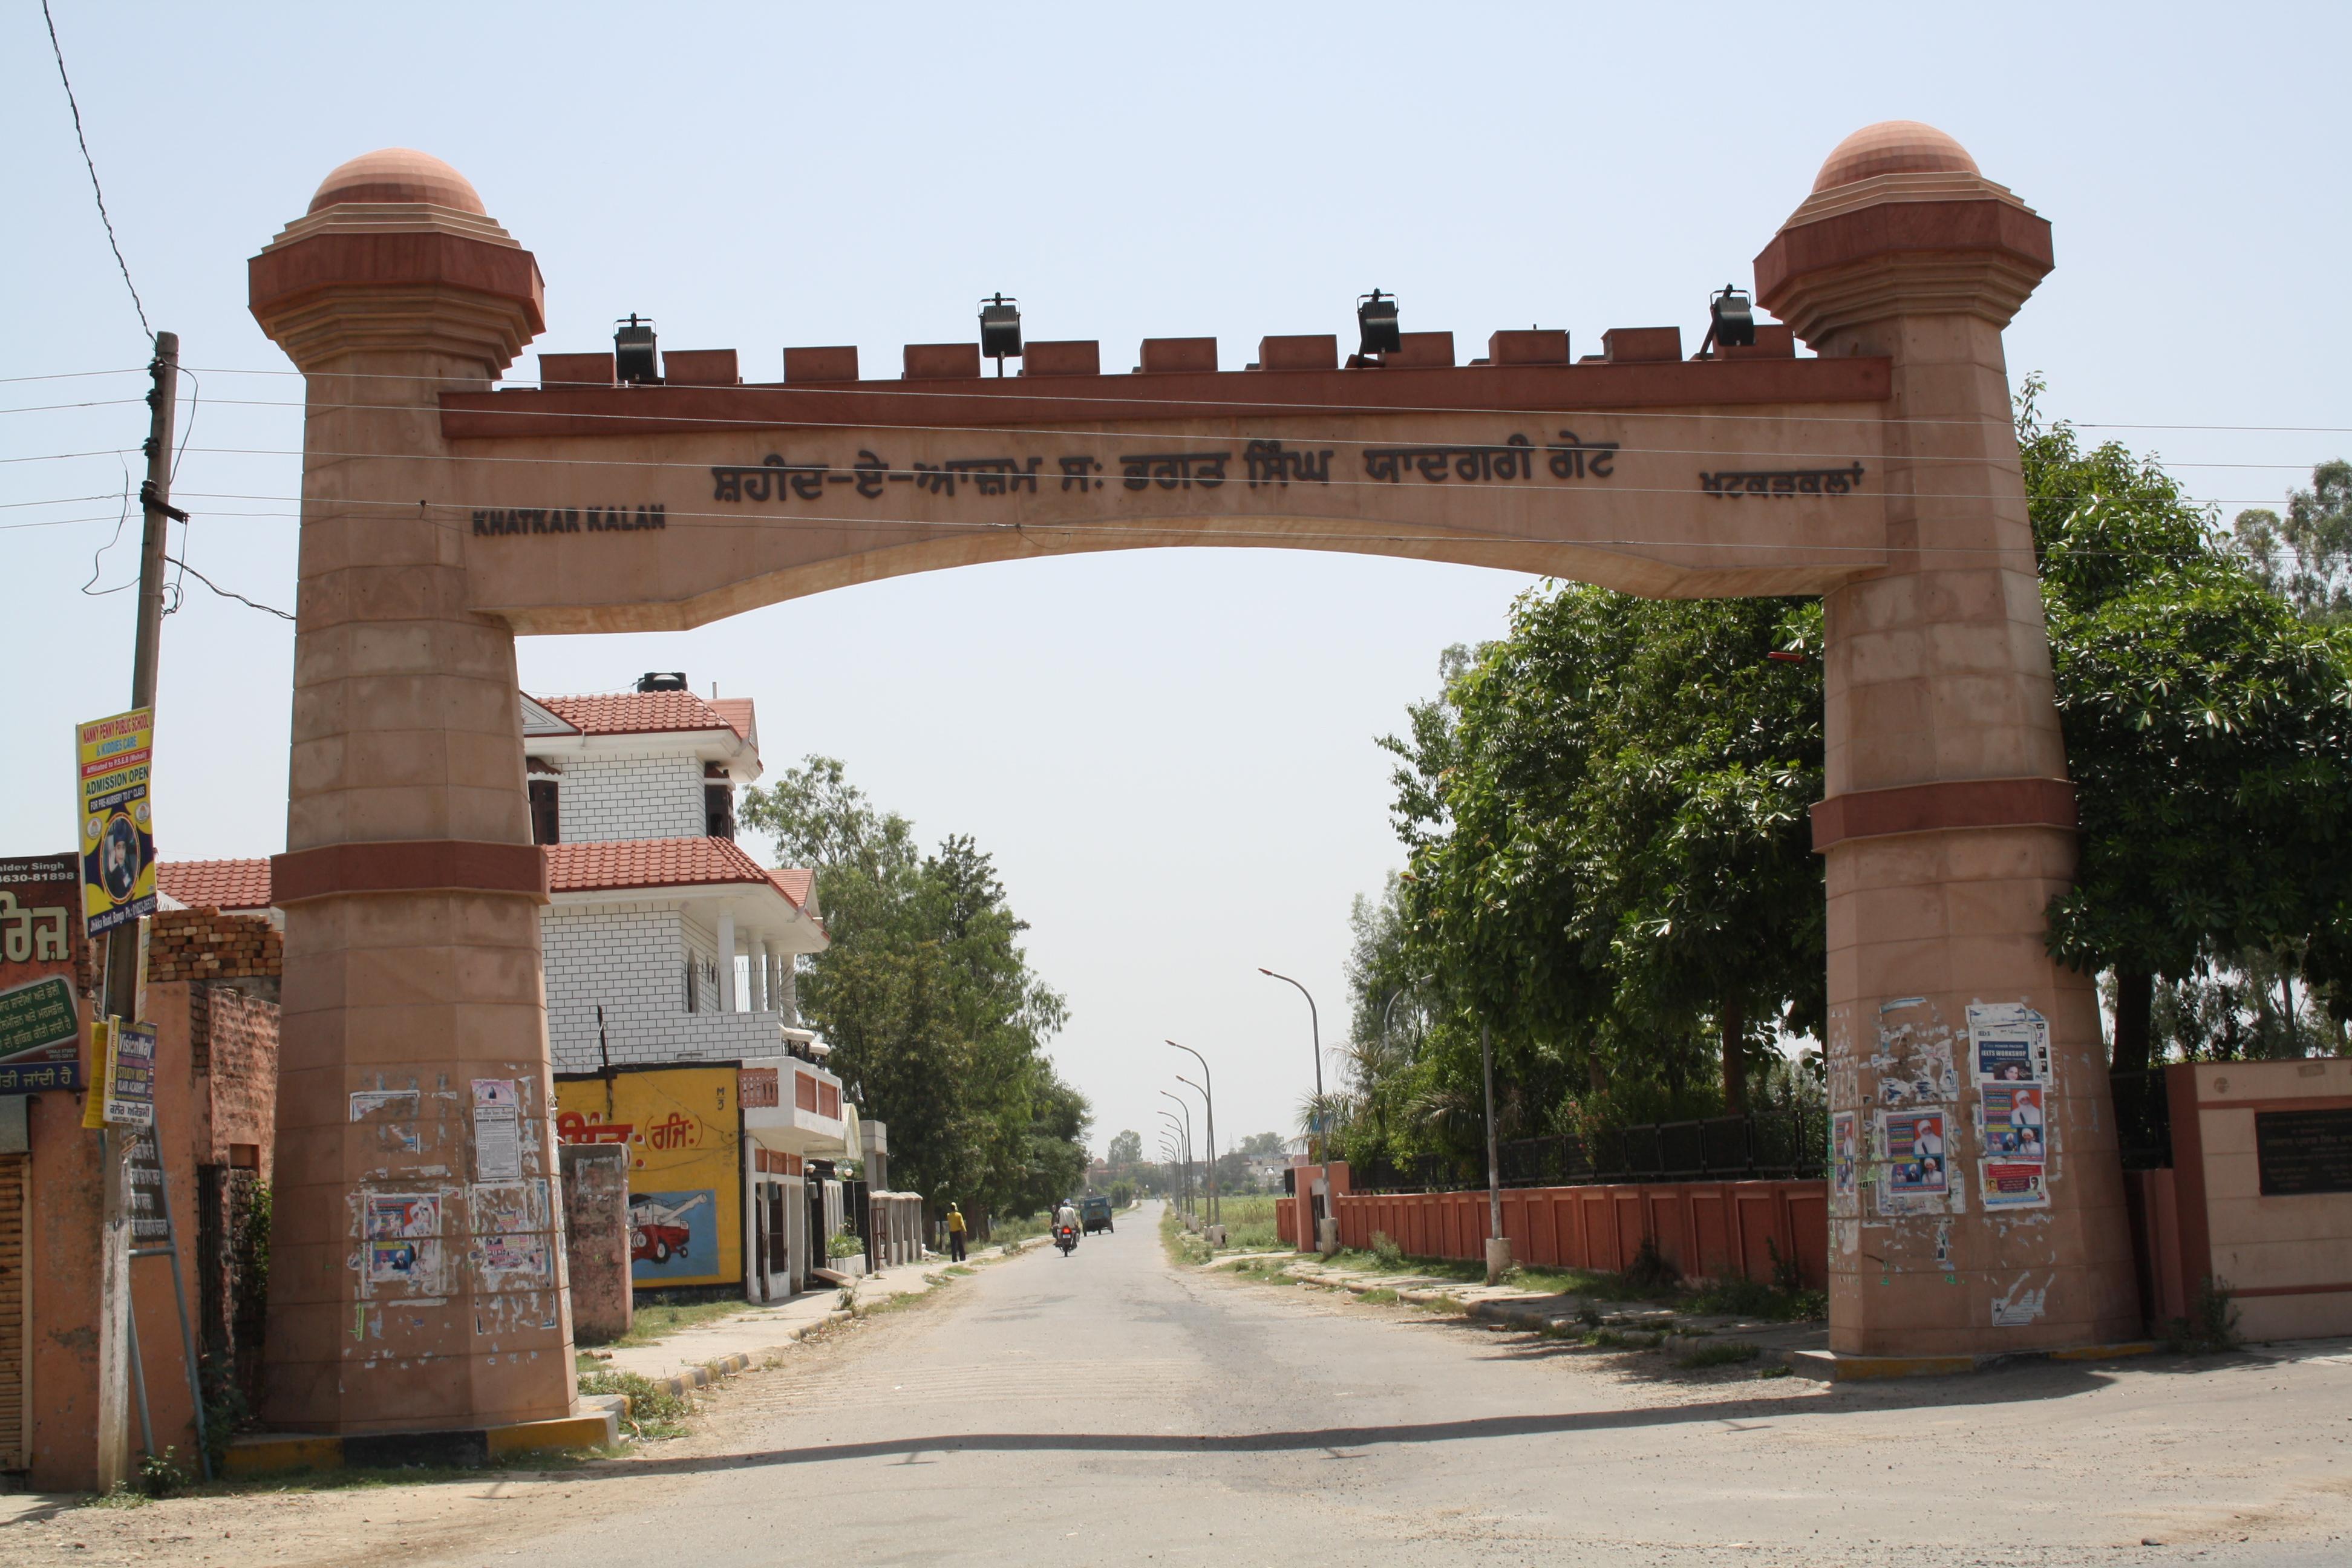 Khatkar Khalan, Bhagat Singh's ancestral home town.